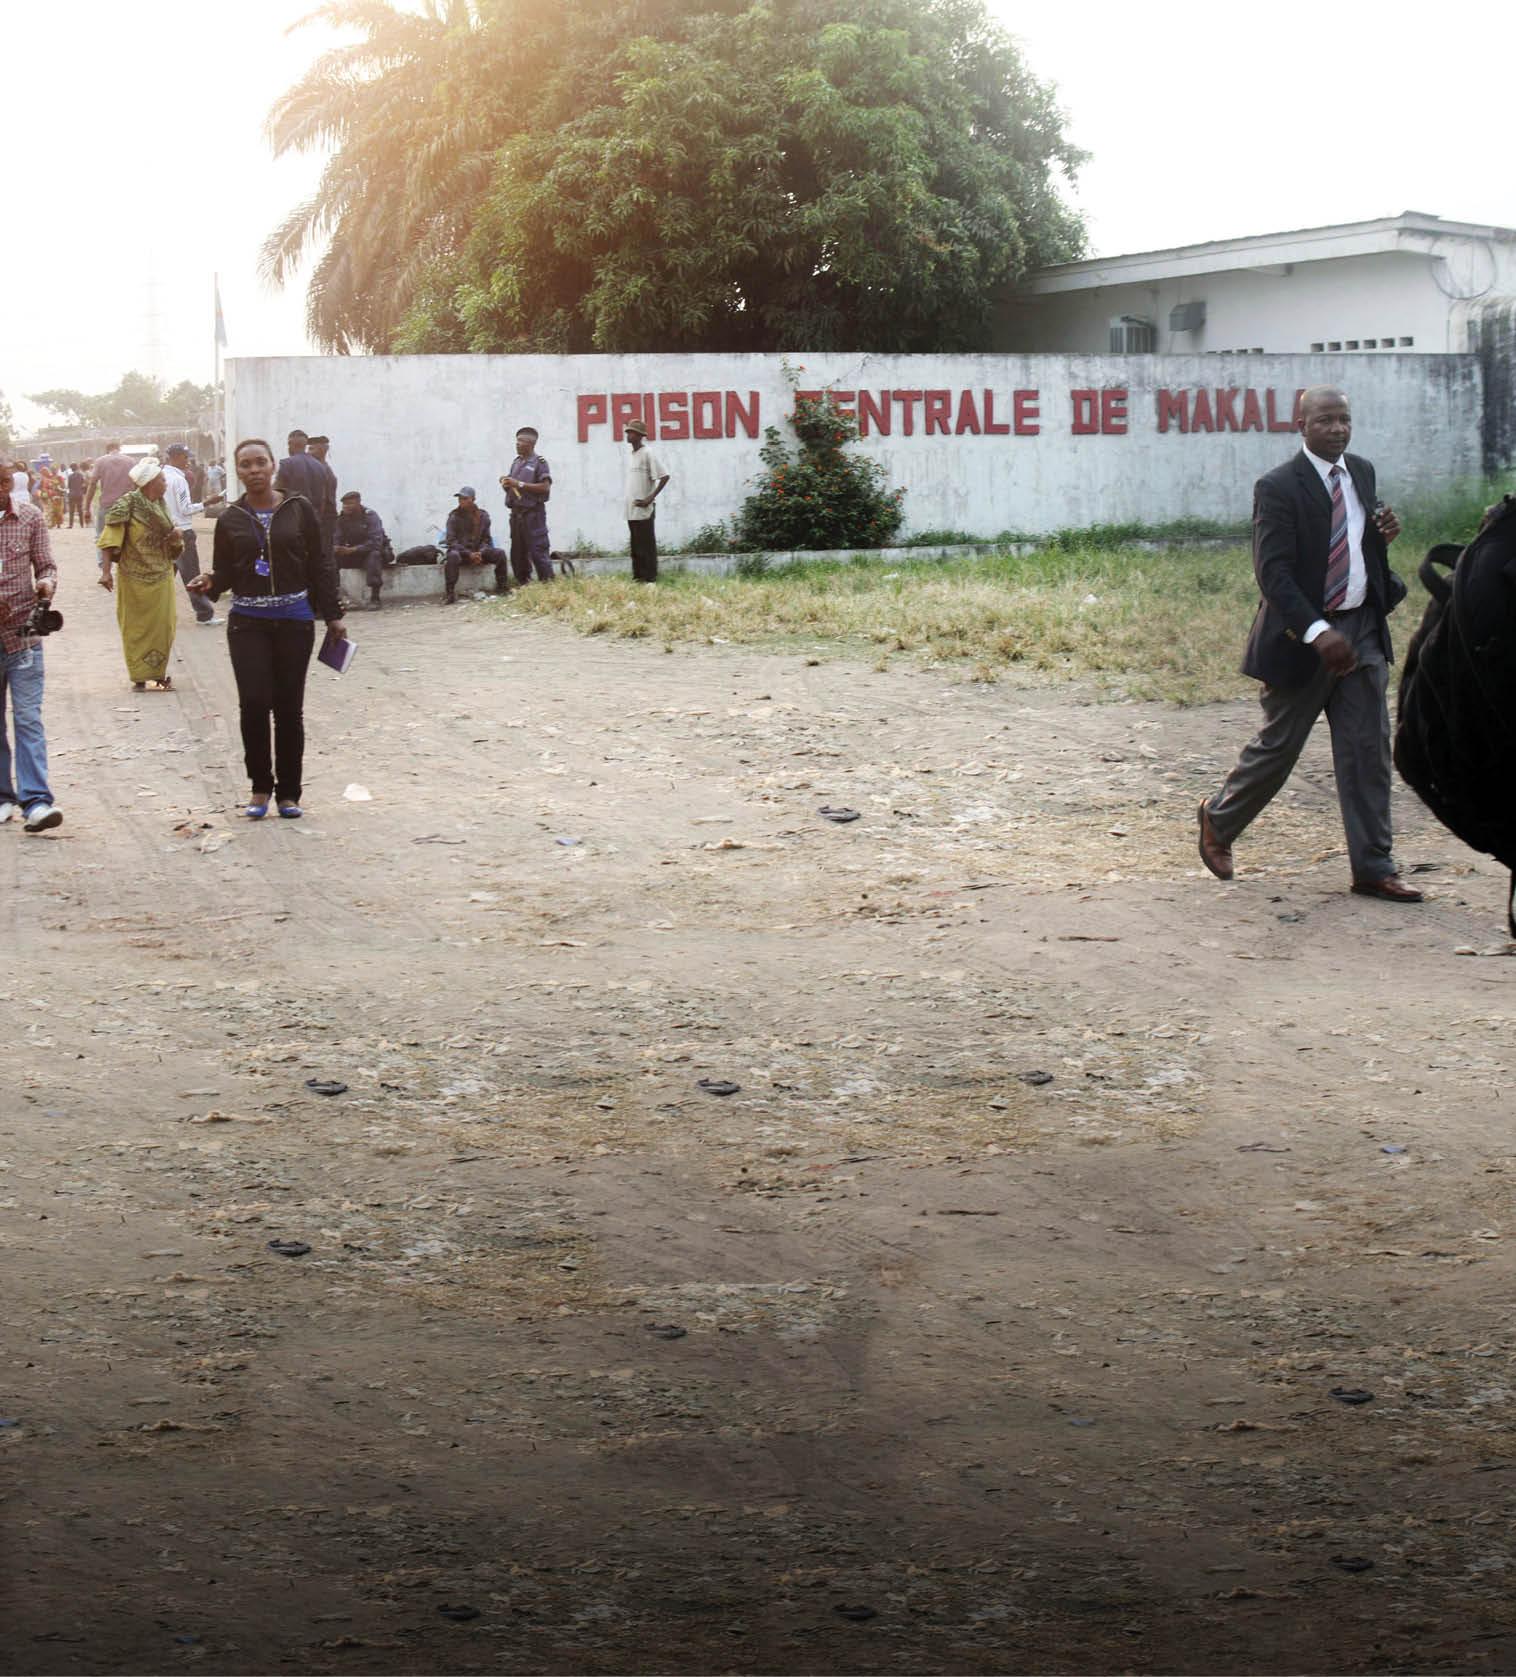 La prison de Makala, à Kinshasa, en RDC.